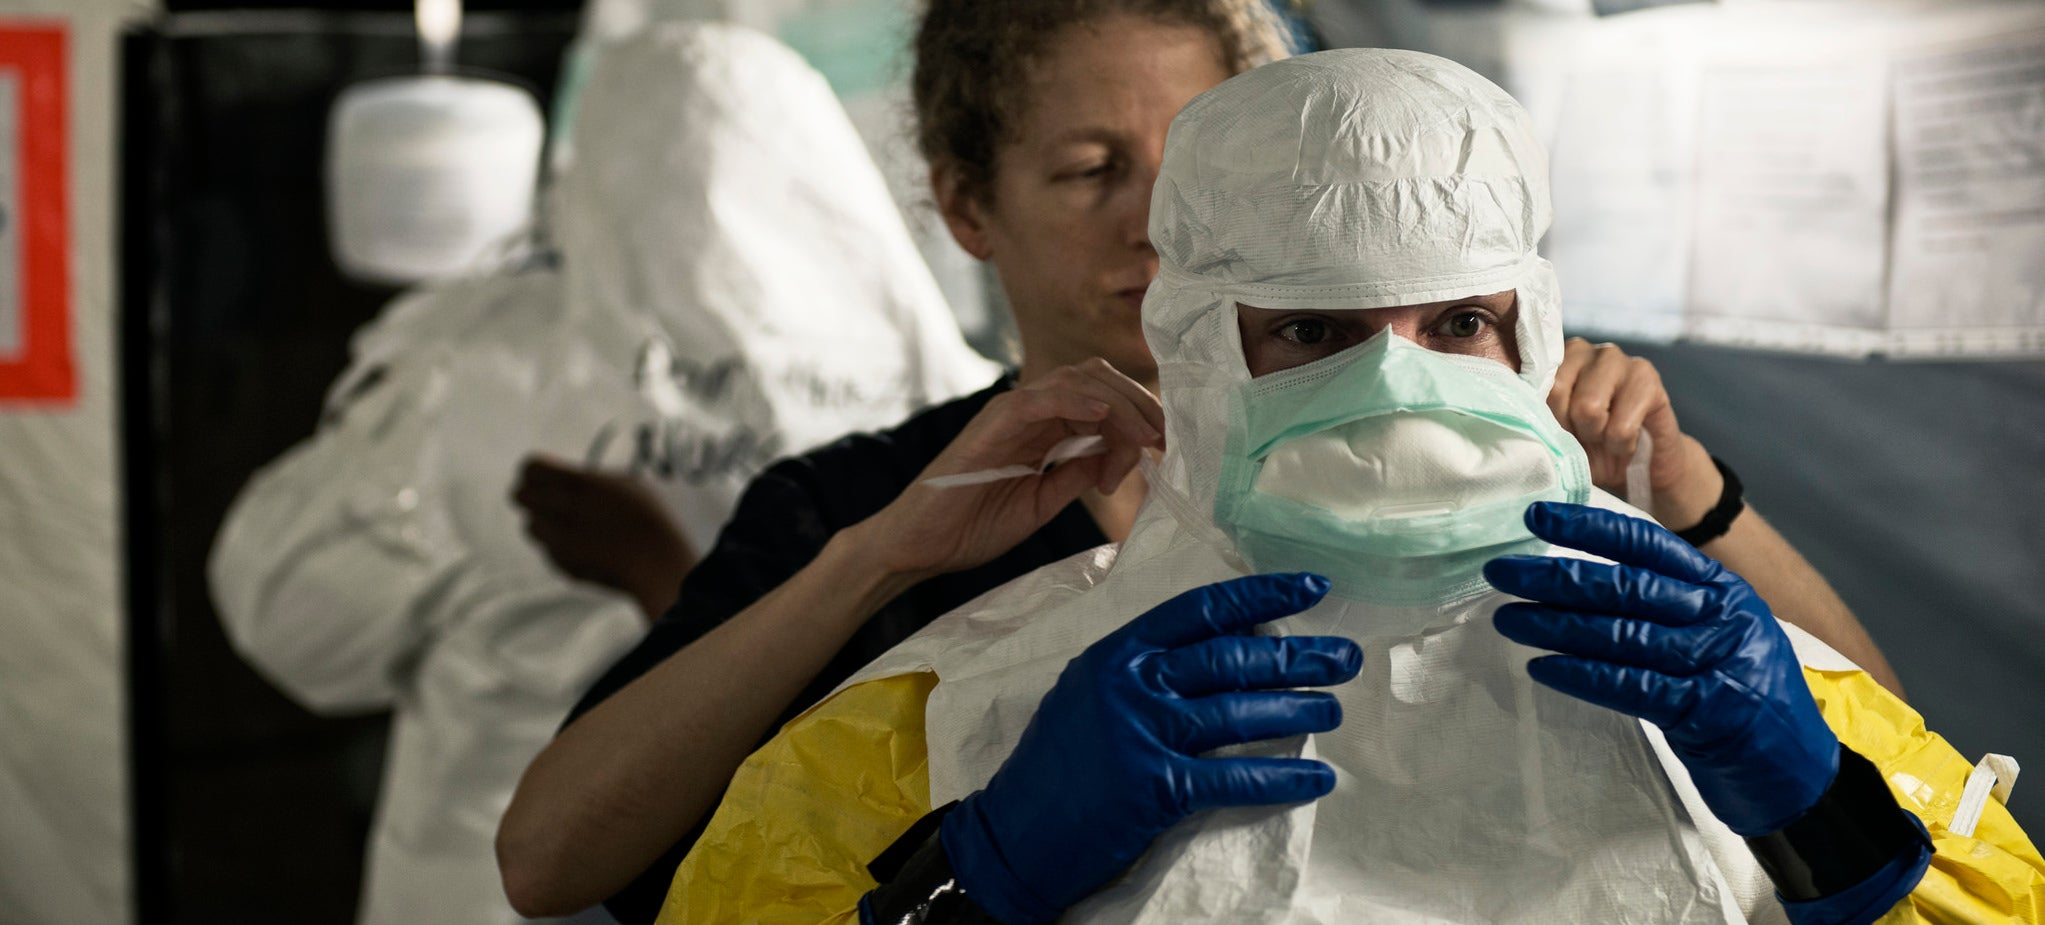 New Case of Ebola Confirmed in Sierra Leone